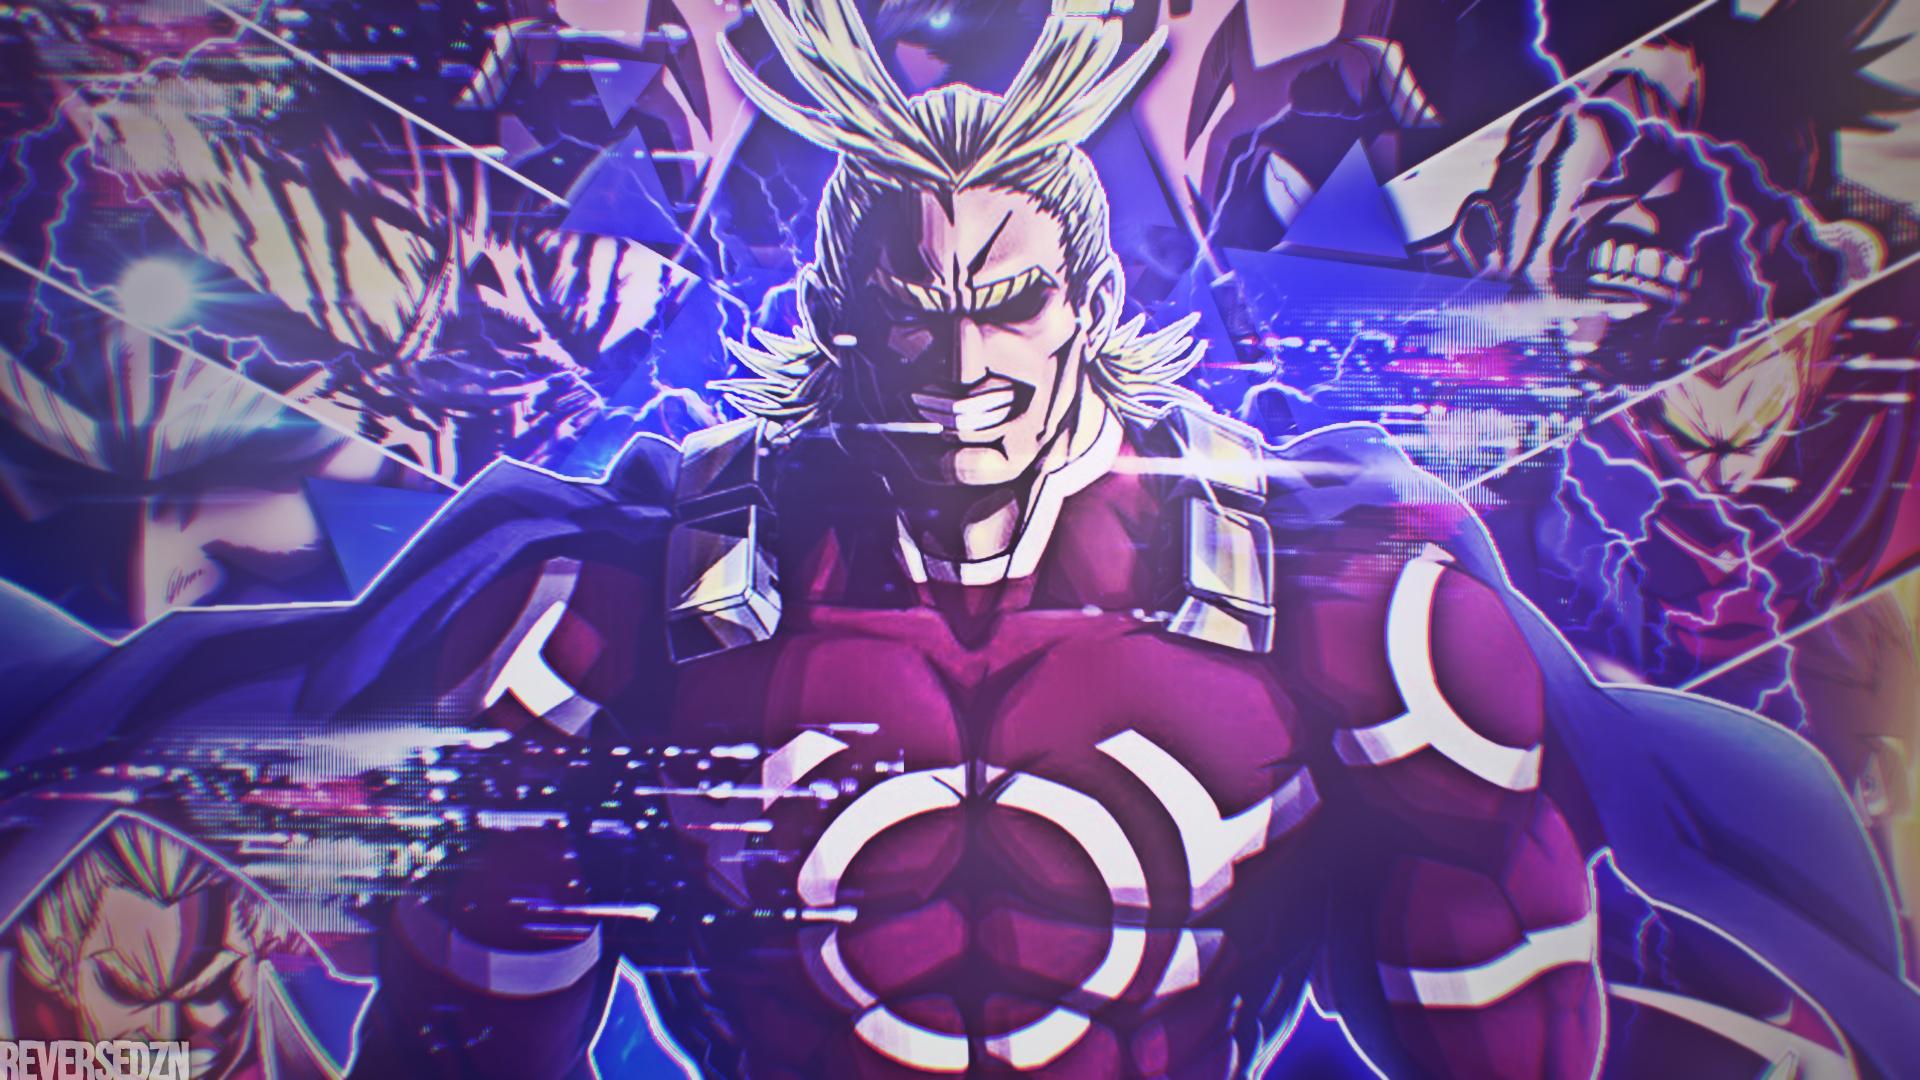 All Might Boku No Hero Academia Wallpaper By Reverseflashdzn On